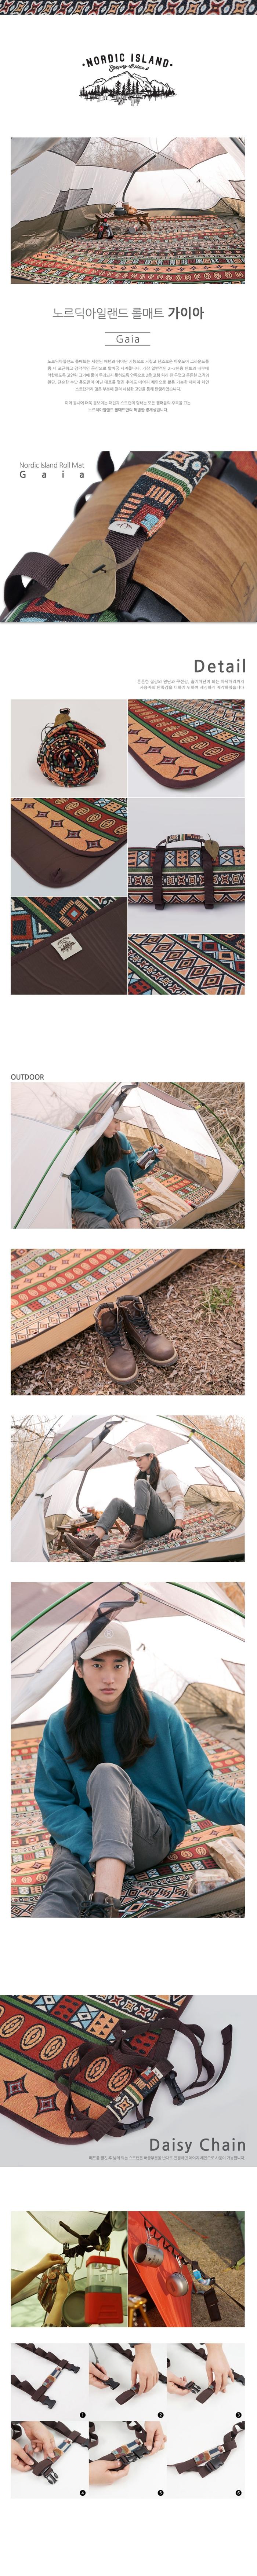 (複製)NORDIC ISLAND | Roll mat防水野餐墊 (Ersa)